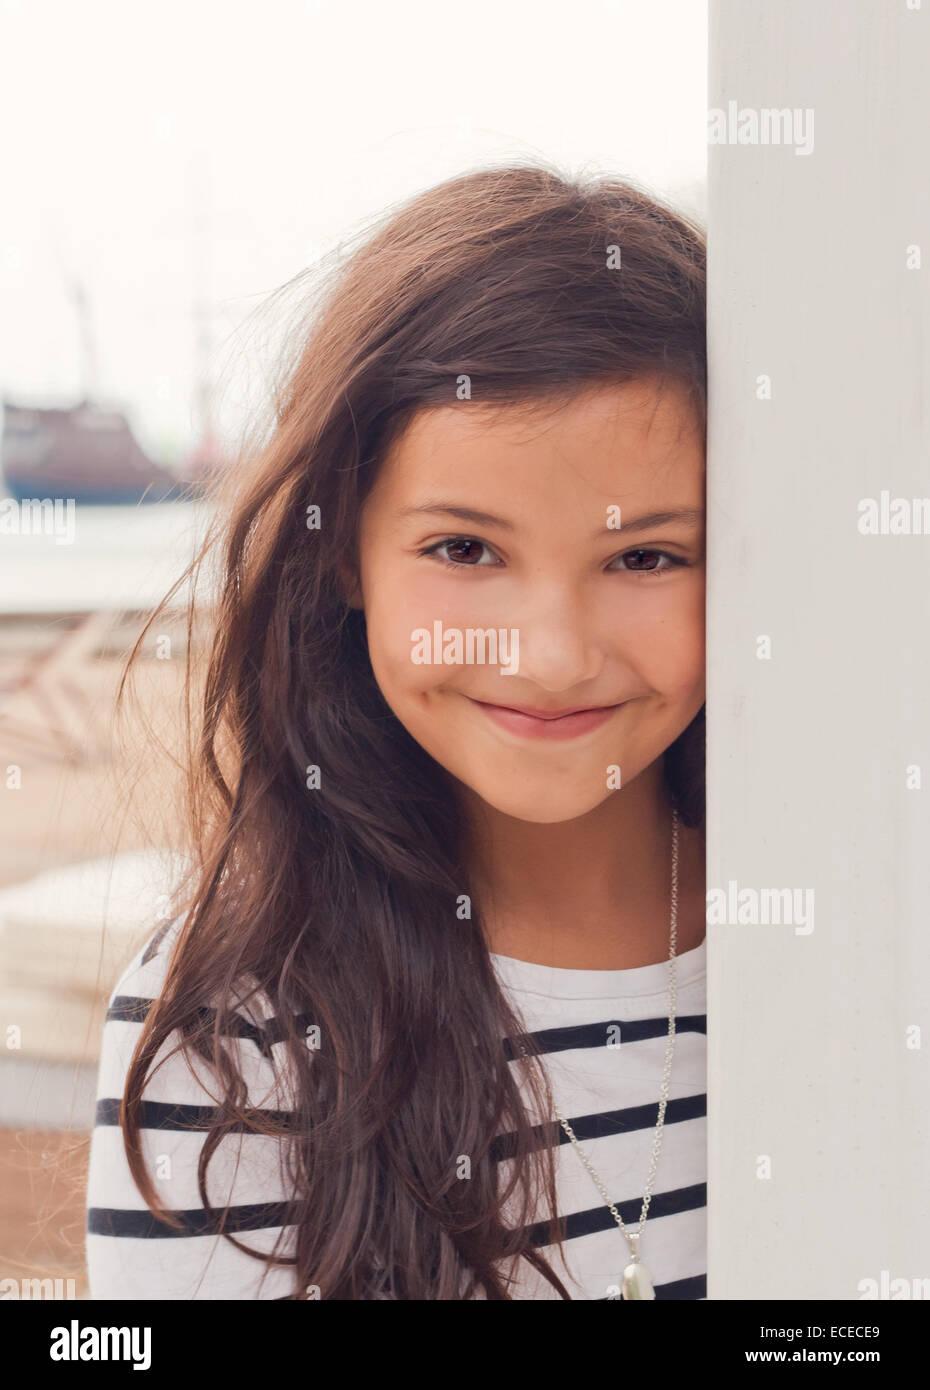 Jolie petite fille (6-7) en robe rayée smiling on beach, près de la mer Photo Stock